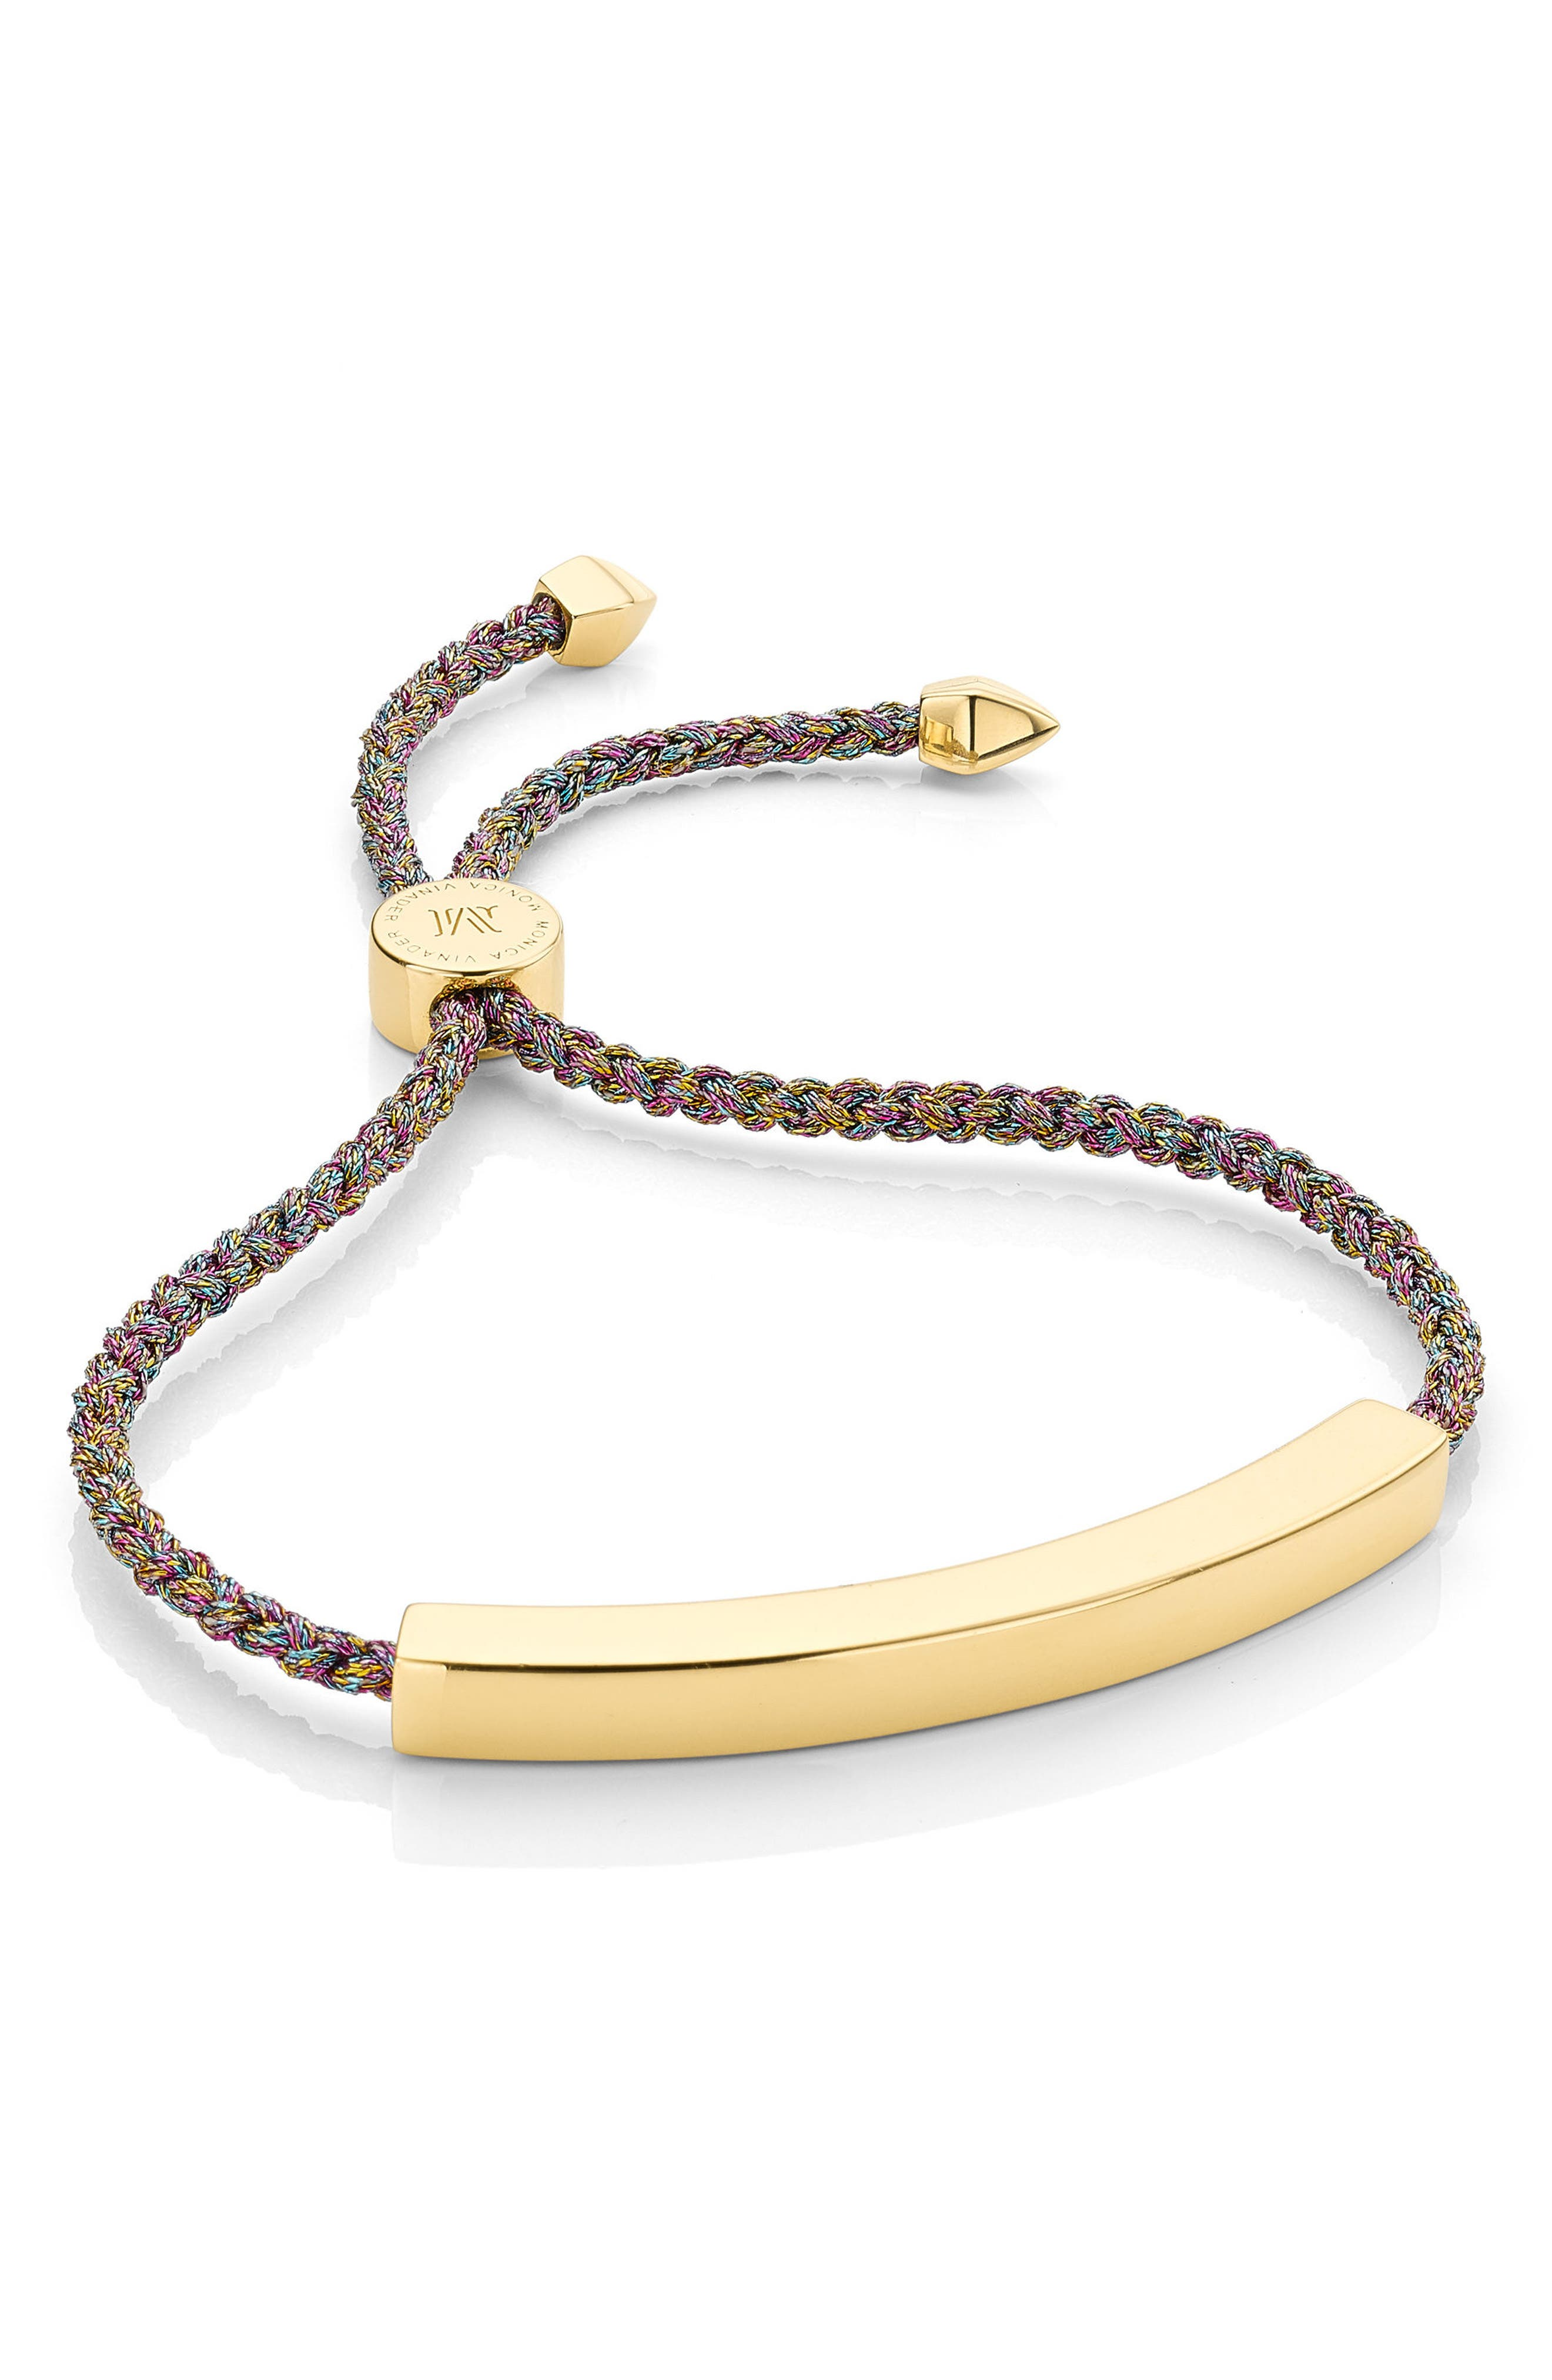 Engravable Large Linear Friendship Bracelet,                             Main thumbnail 1, color,                             RAINBOW METALLIC/ YELLOW GOLD